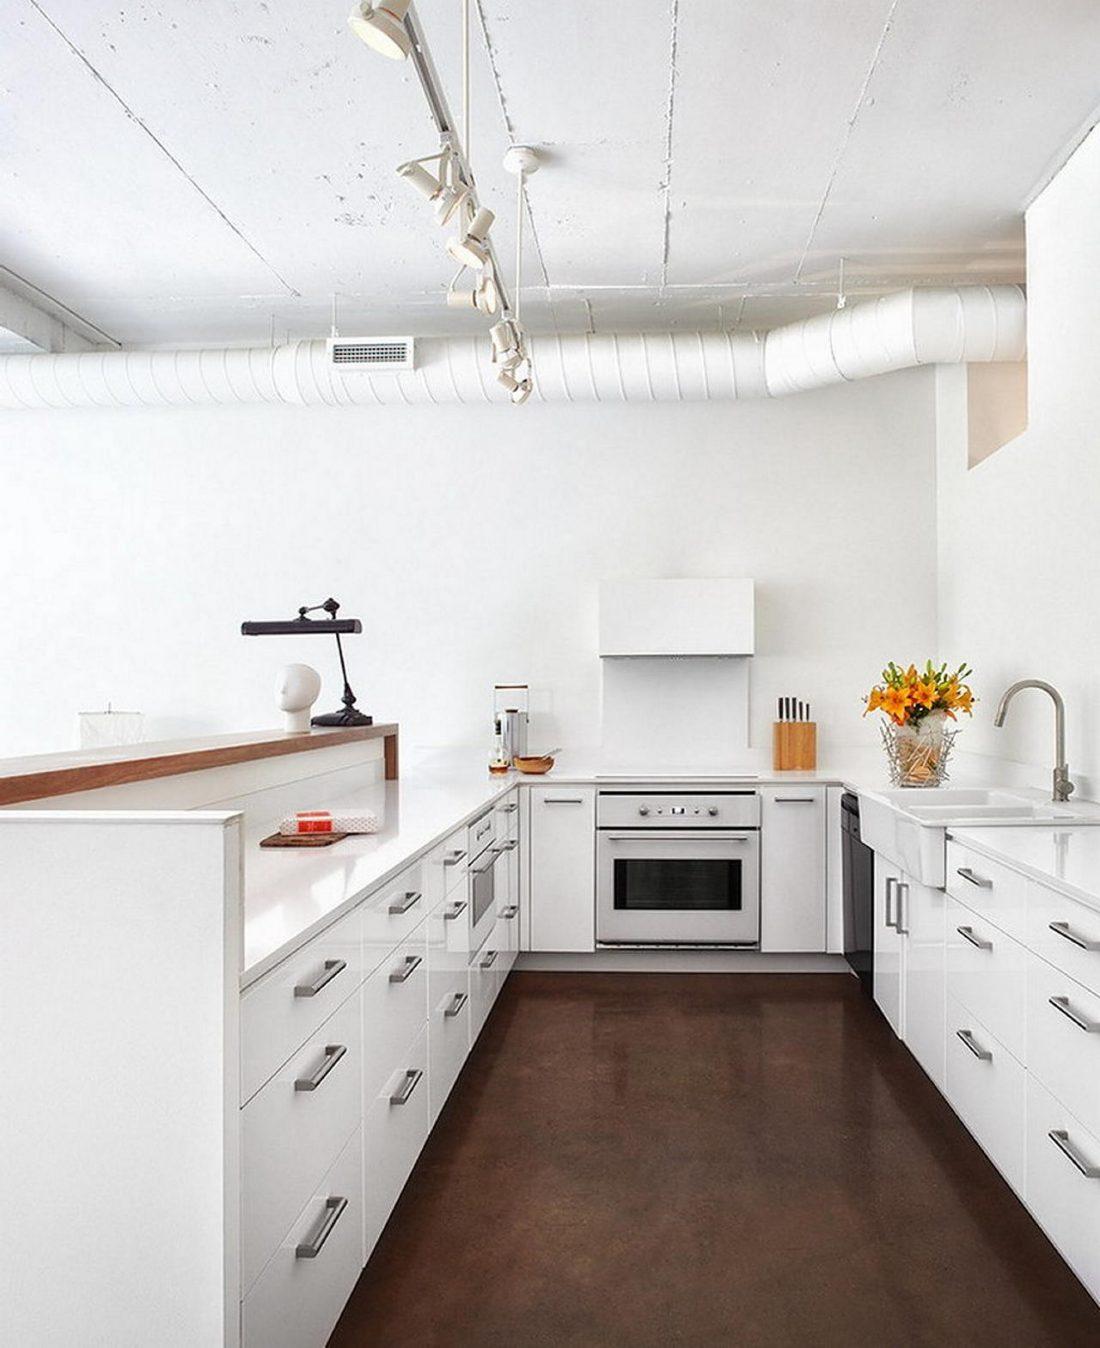 Дизайн интерьера квартиры в стиле лофт 31